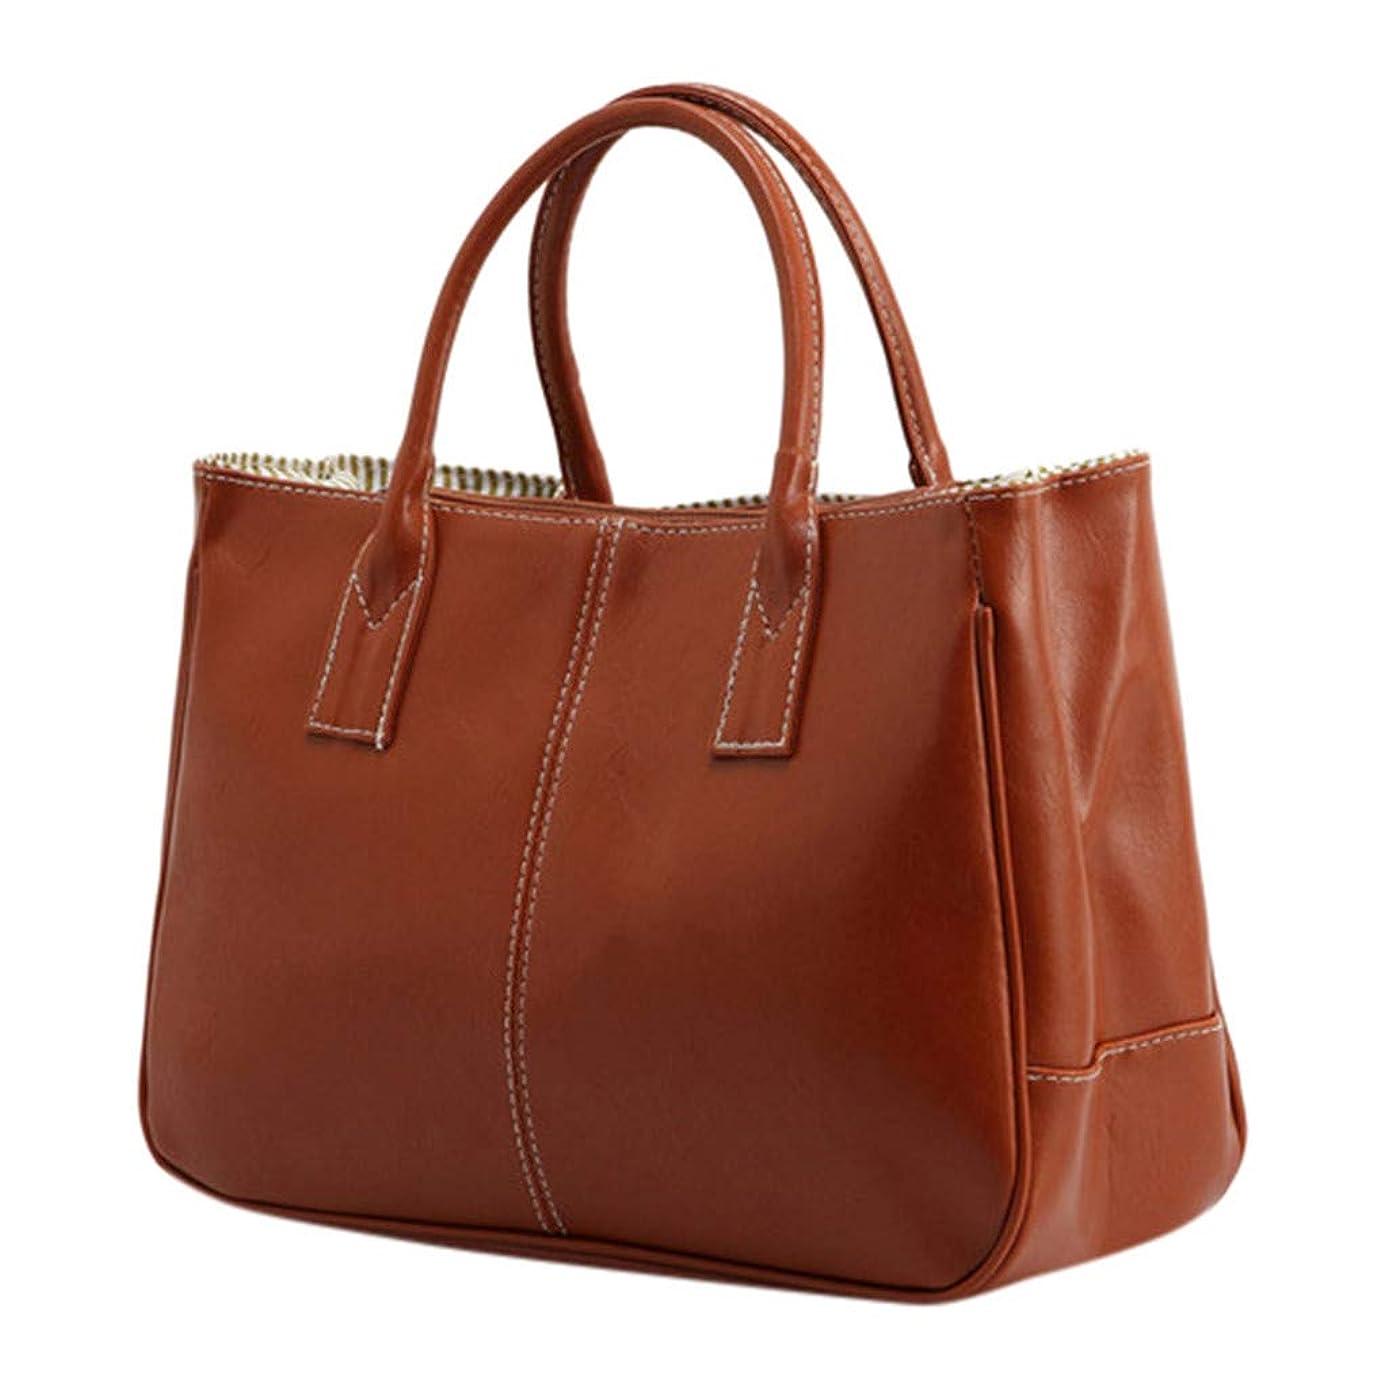 Leather Handbags for Women Top Handle Handbags Large Capacity Cosmetic Travel Bag Waterproof Tote Bags Purse (Brown)